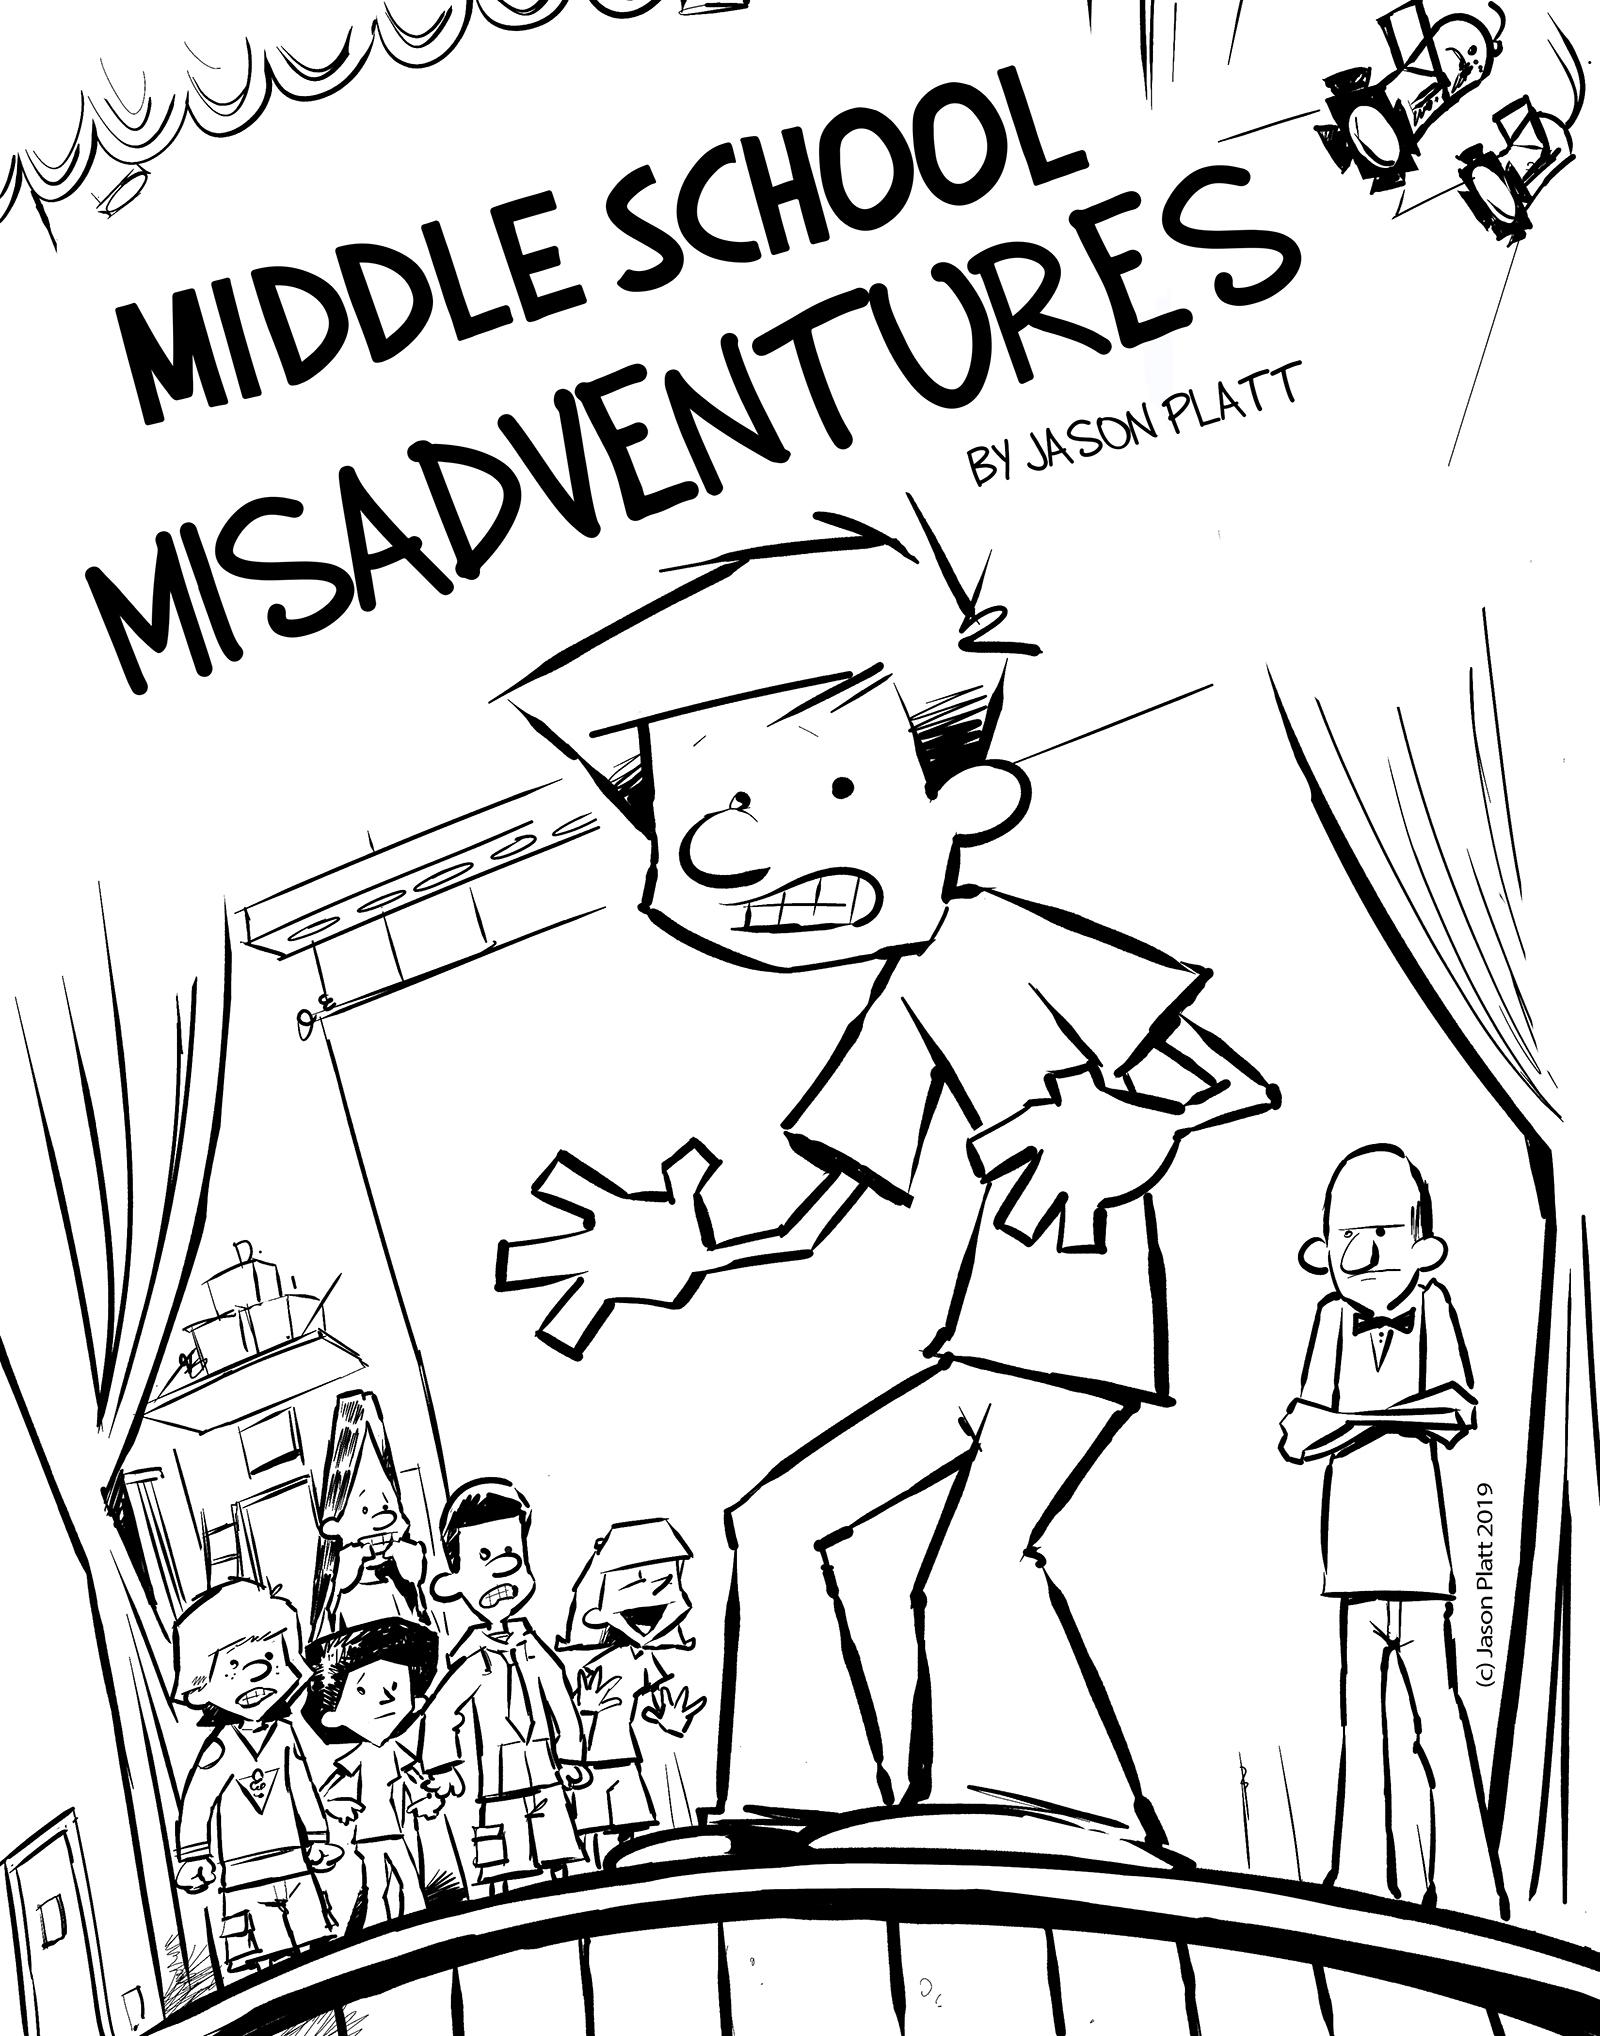 MiddleSchoolMisadventures_Coloring Page_3.jpg